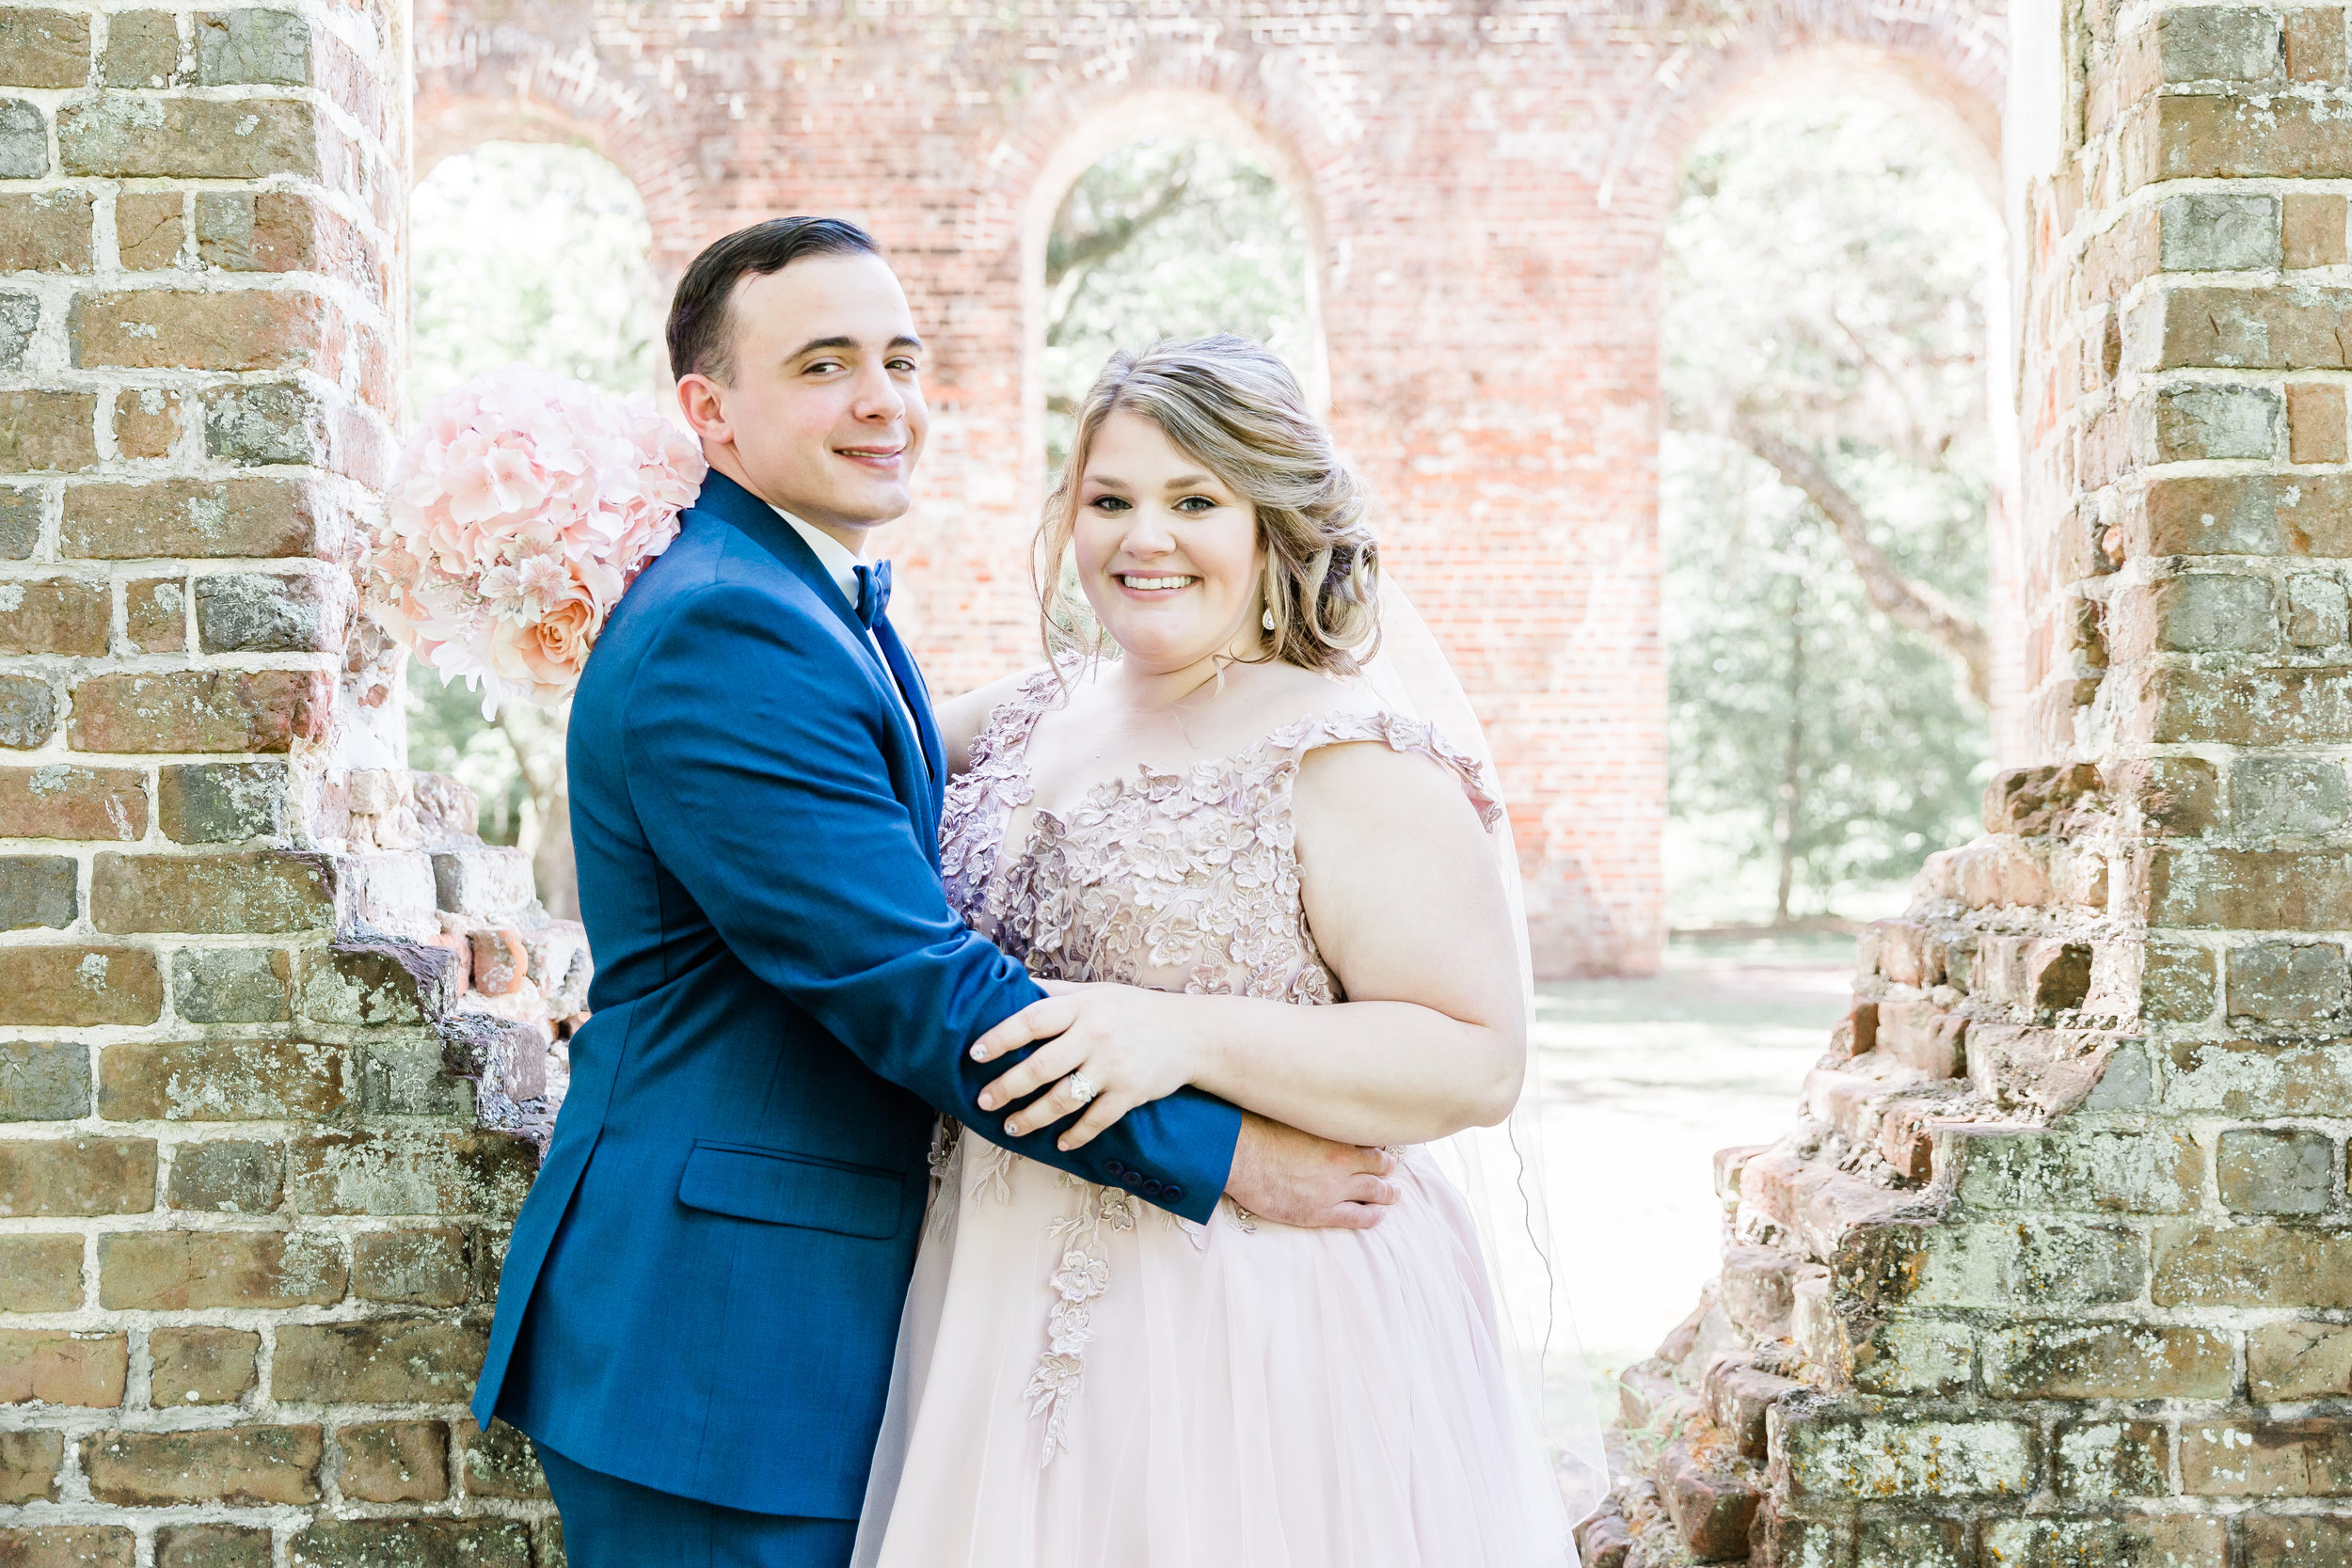 20190417-Southern Lens Photography-savannah family photographer- Ashley and Zack-old sheldon church ruins-201963.jpg